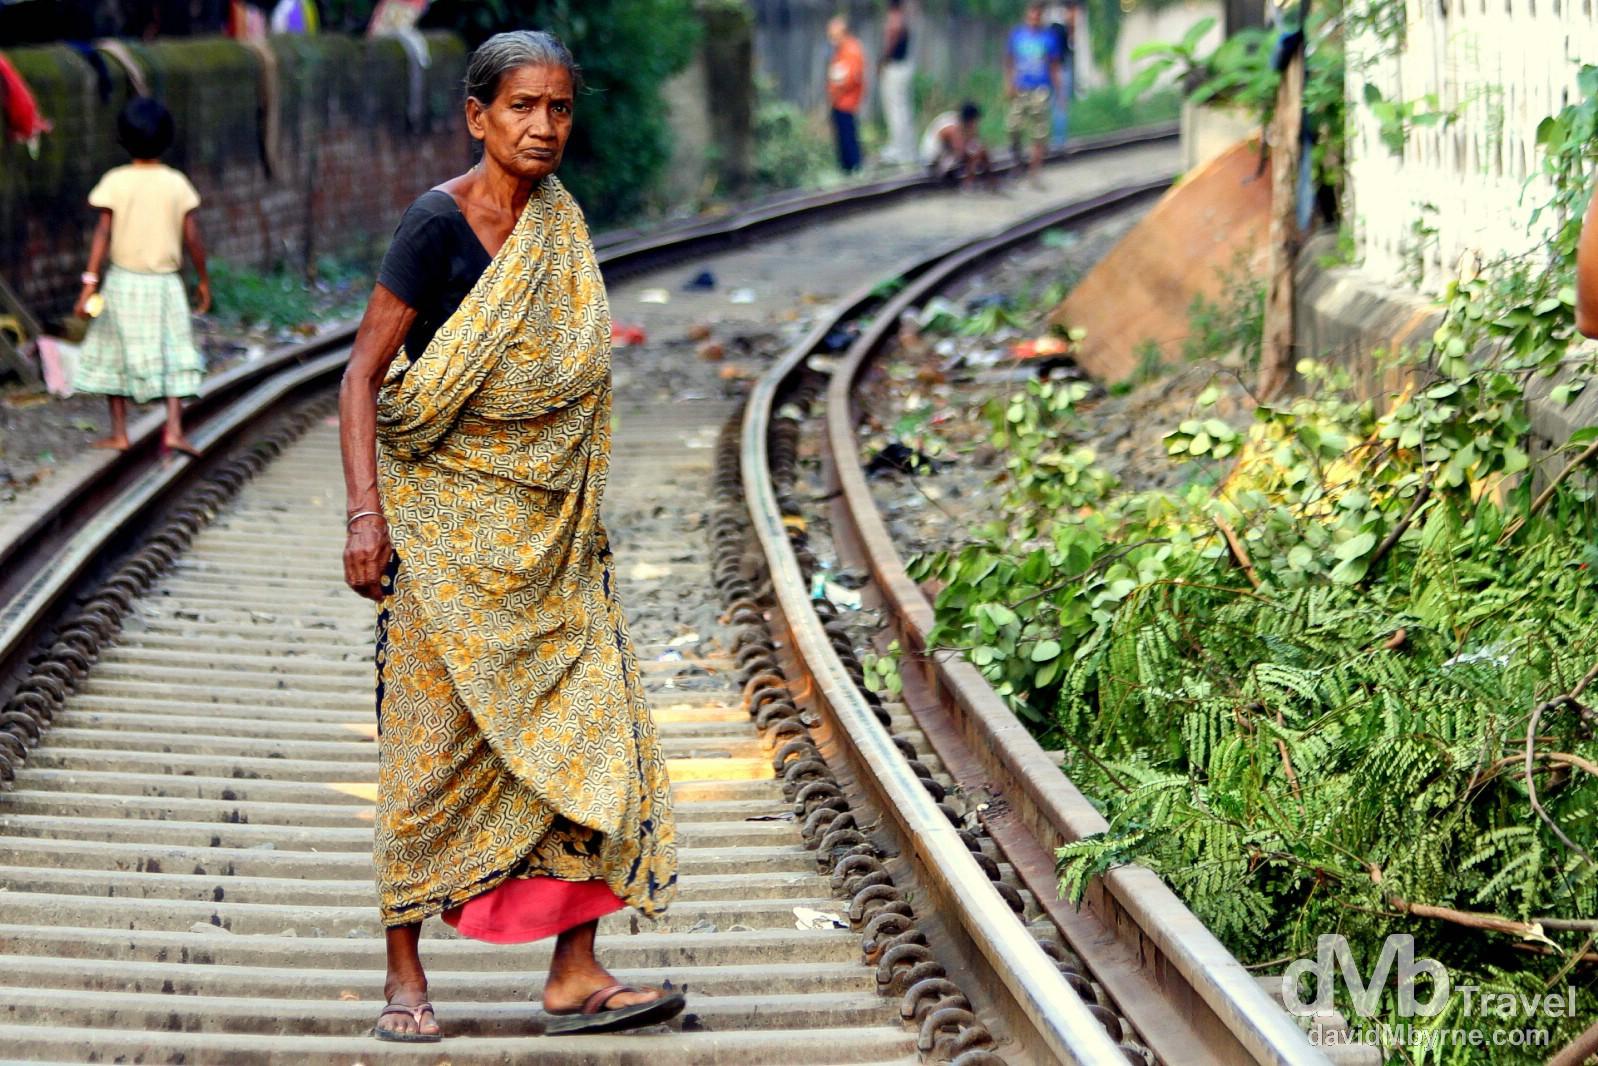 Crossing the train tracks near the Babu Ghat in Kolkata (Calcutta), West Bengal, India. October 15th 2012.